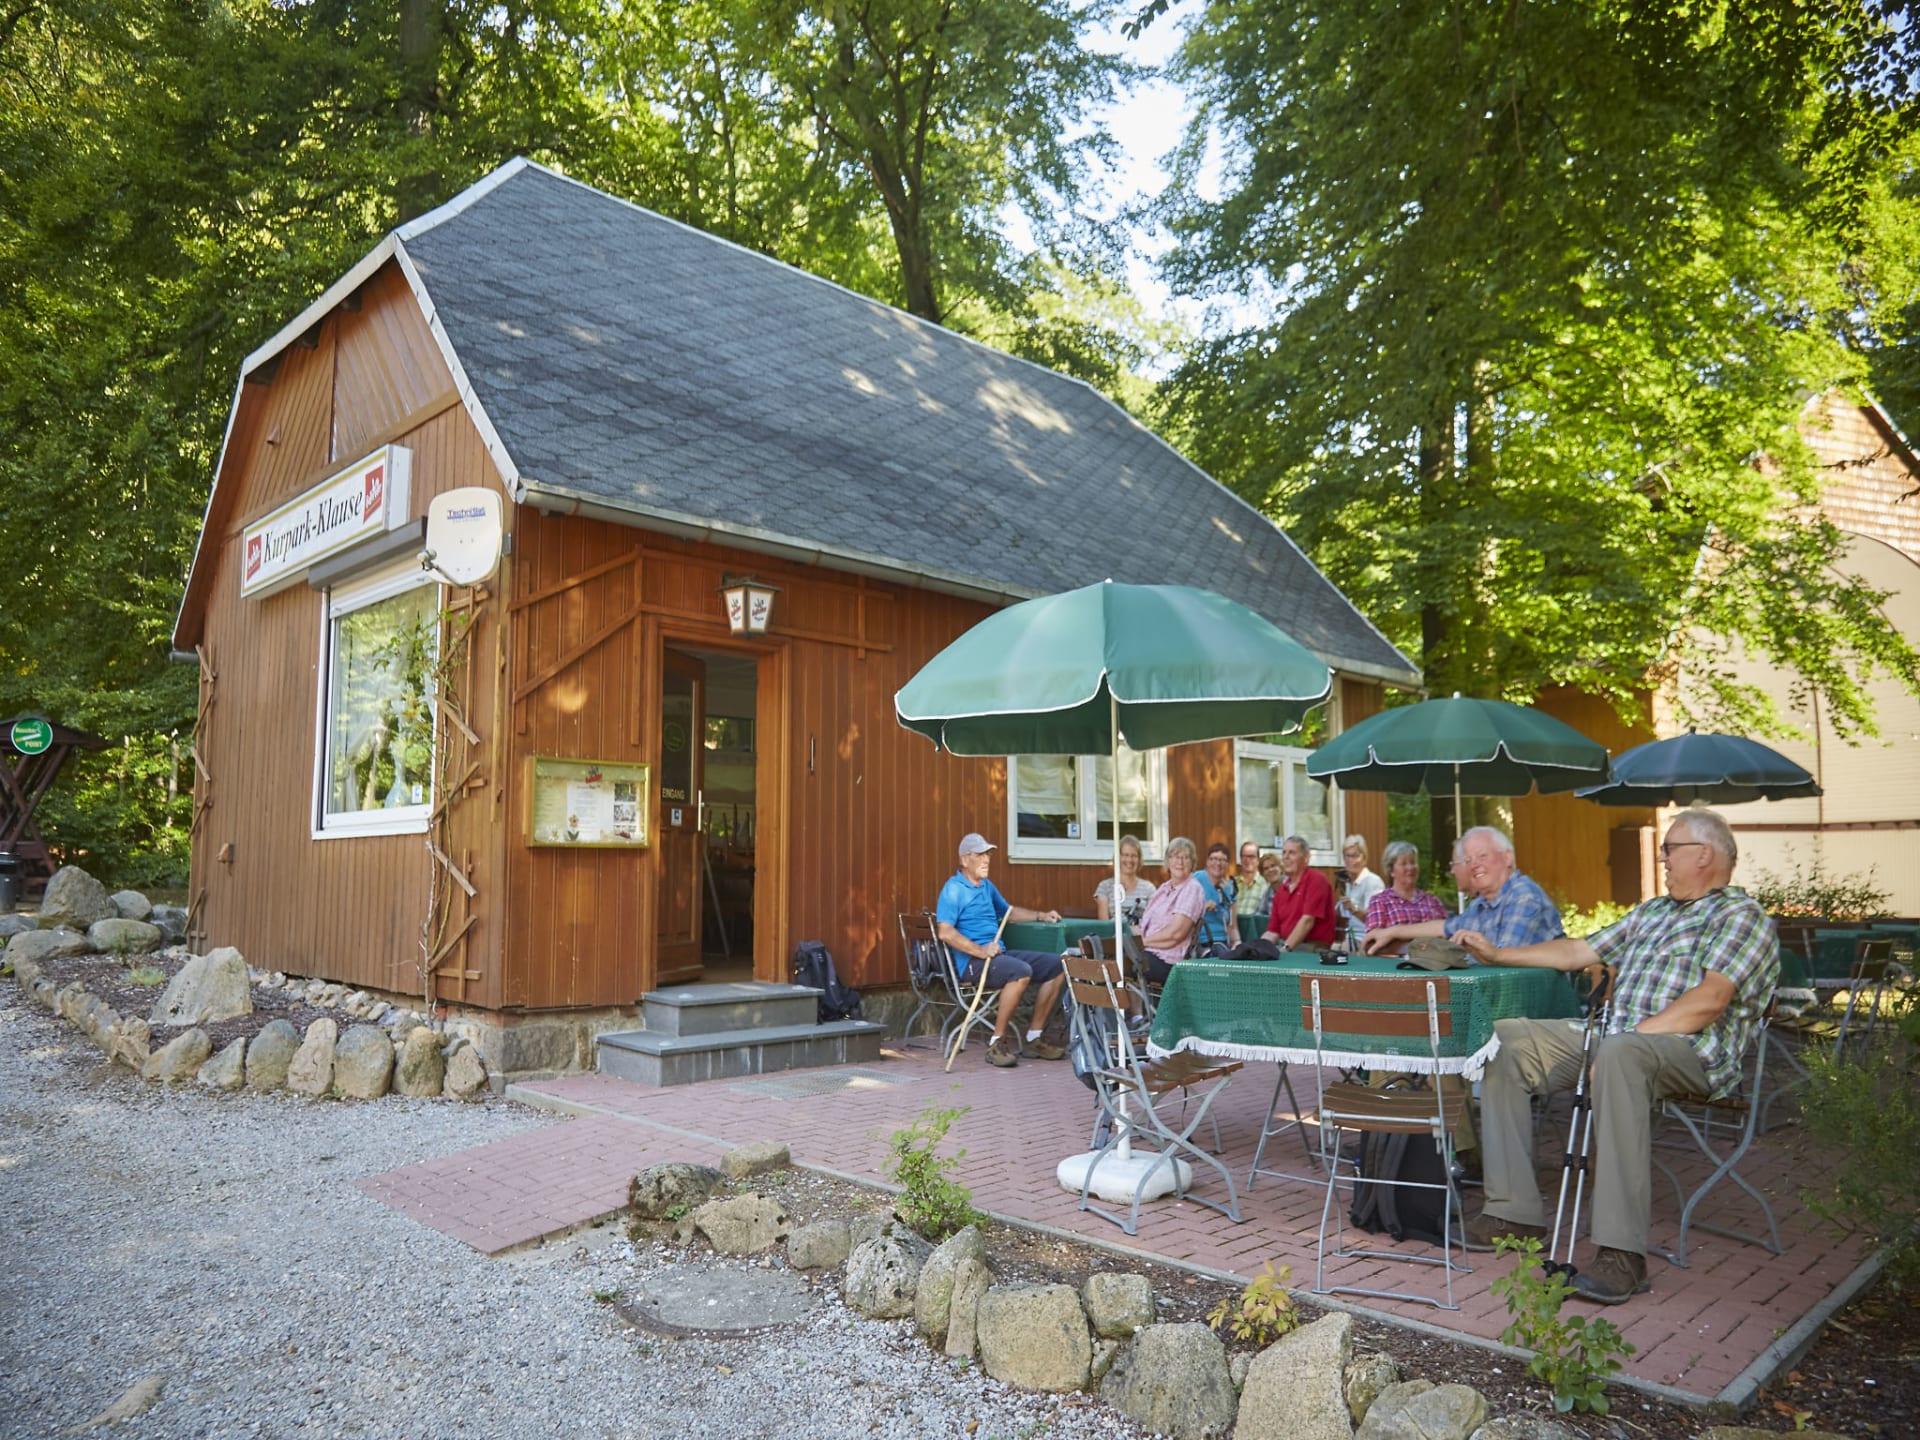 Flair Hotel Grüner Baum Restaurant